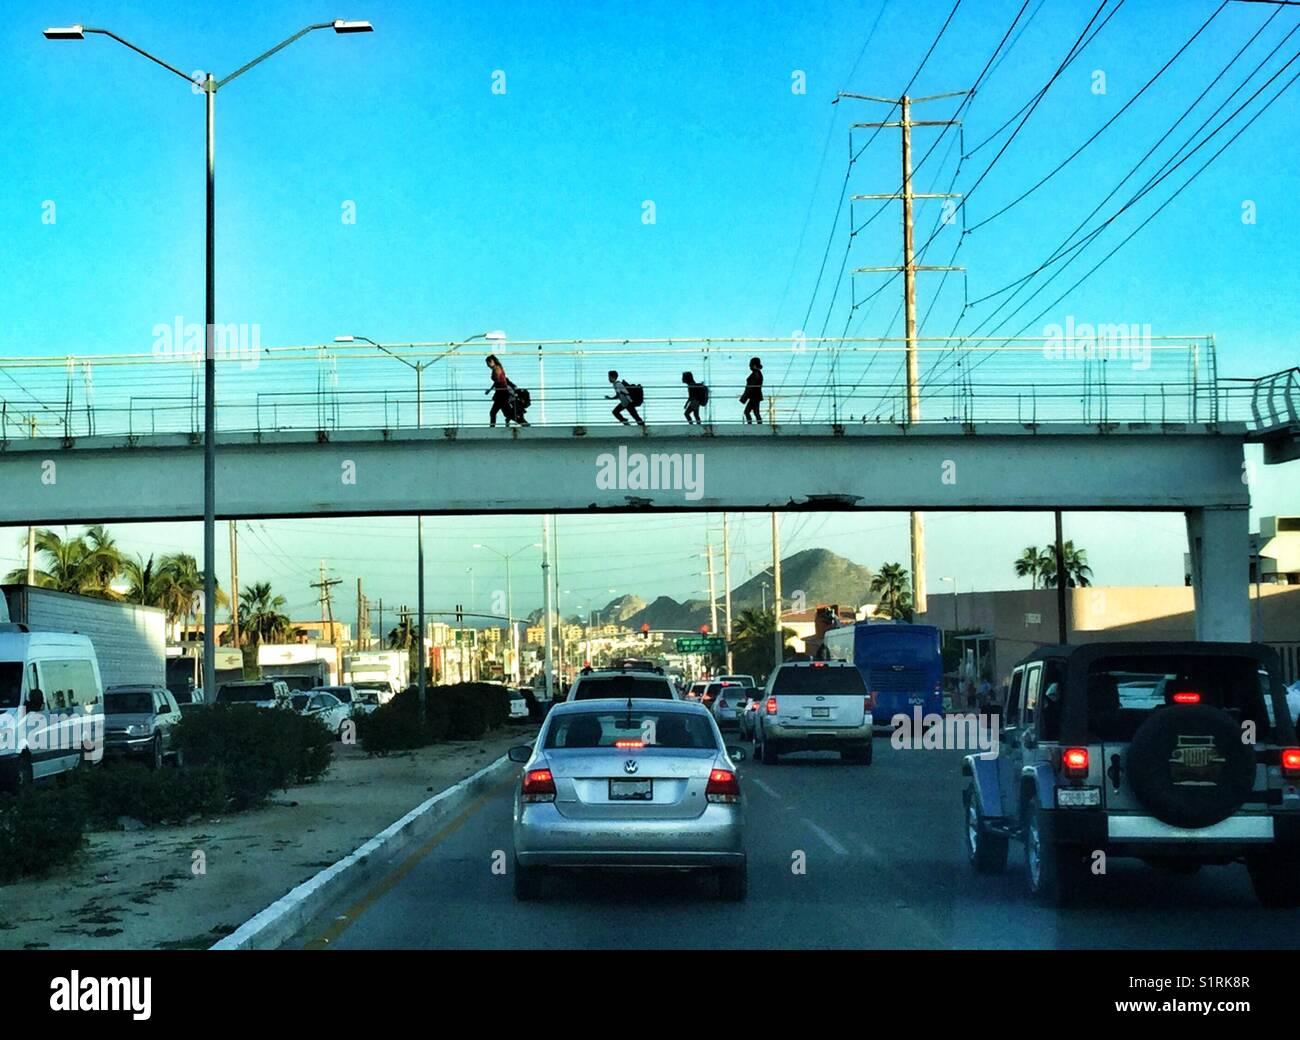 School children running across a bridge over a busy street in Cabo San Lucas, Mexico. - Stock Image